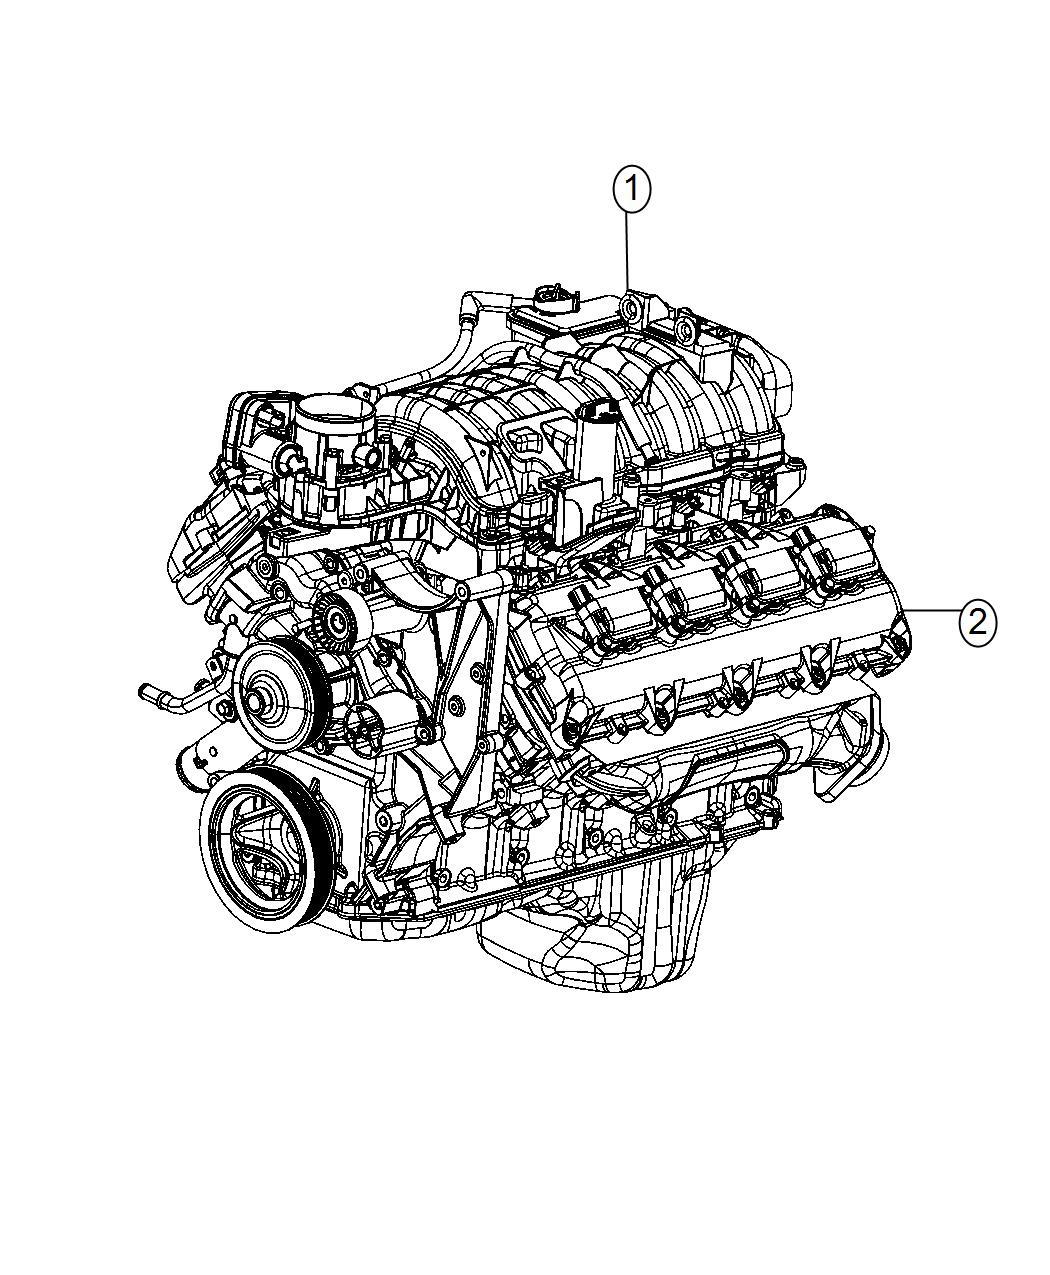 2016 Ram 1500 Engine. Long block. [engine oil cooler